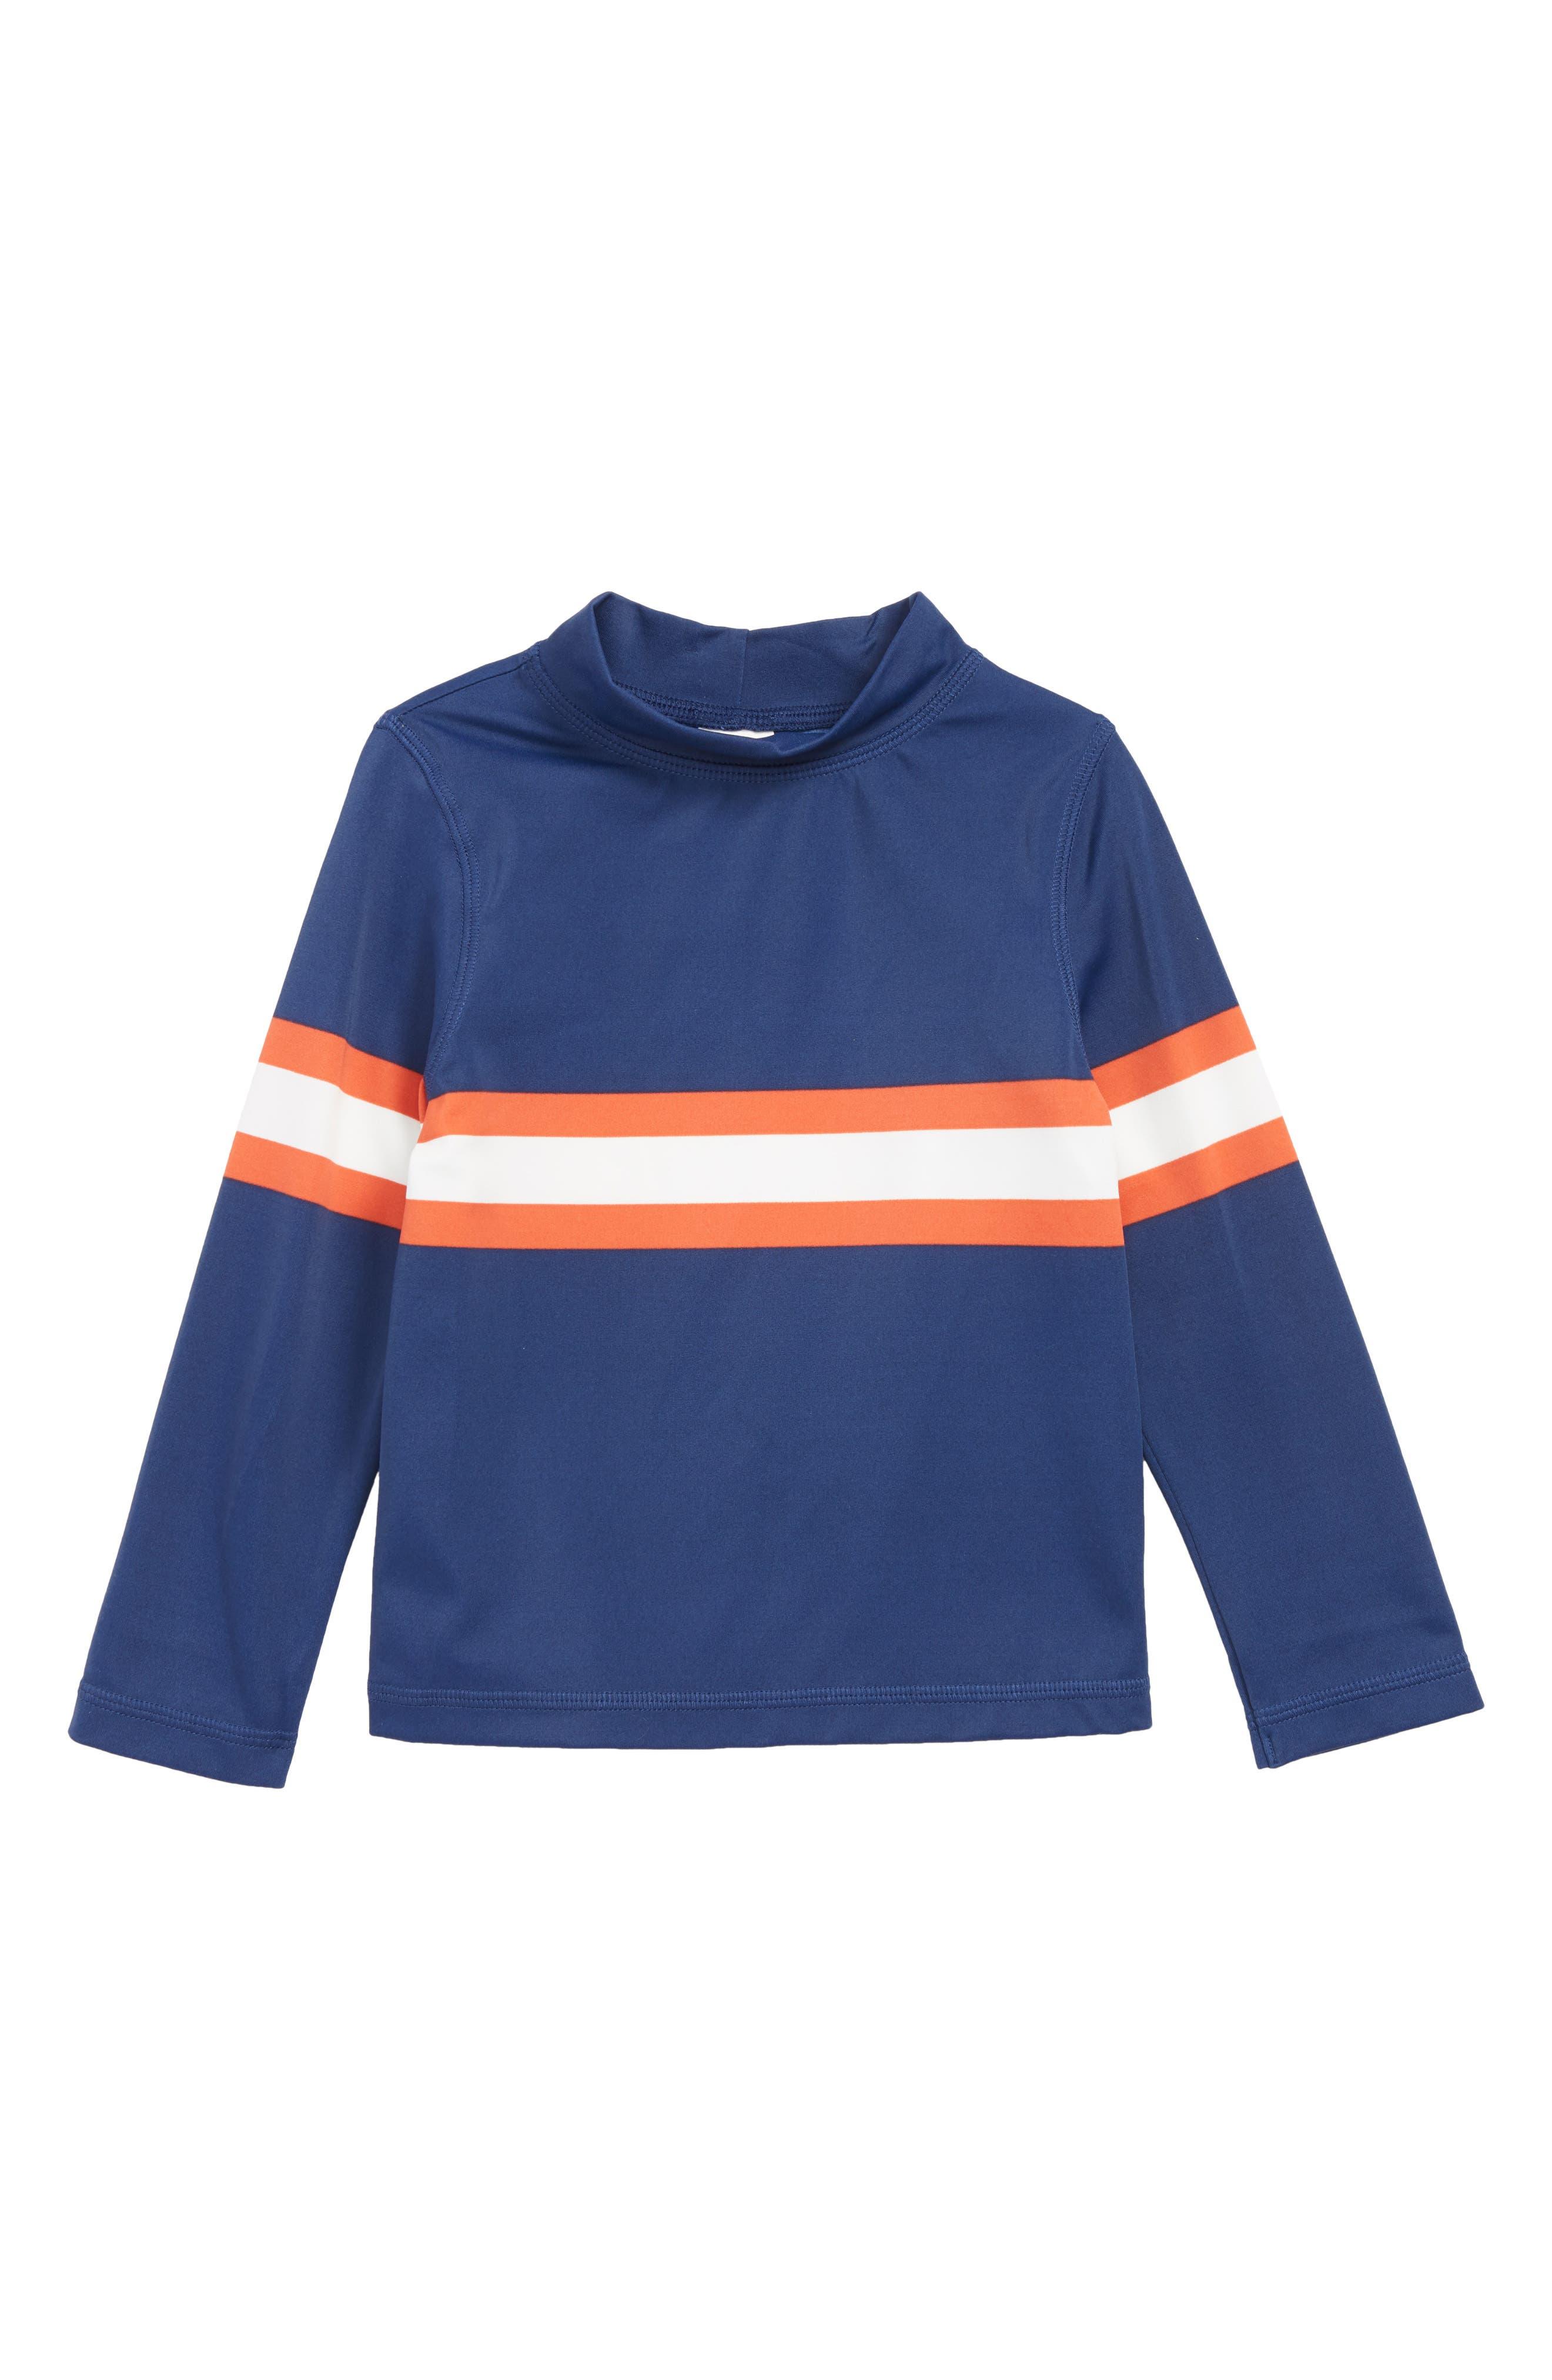 MINI BODEN,                             Chest Stripe Rashguard,                             Main thumbnail 1, color,                             COLLEGE BLUE